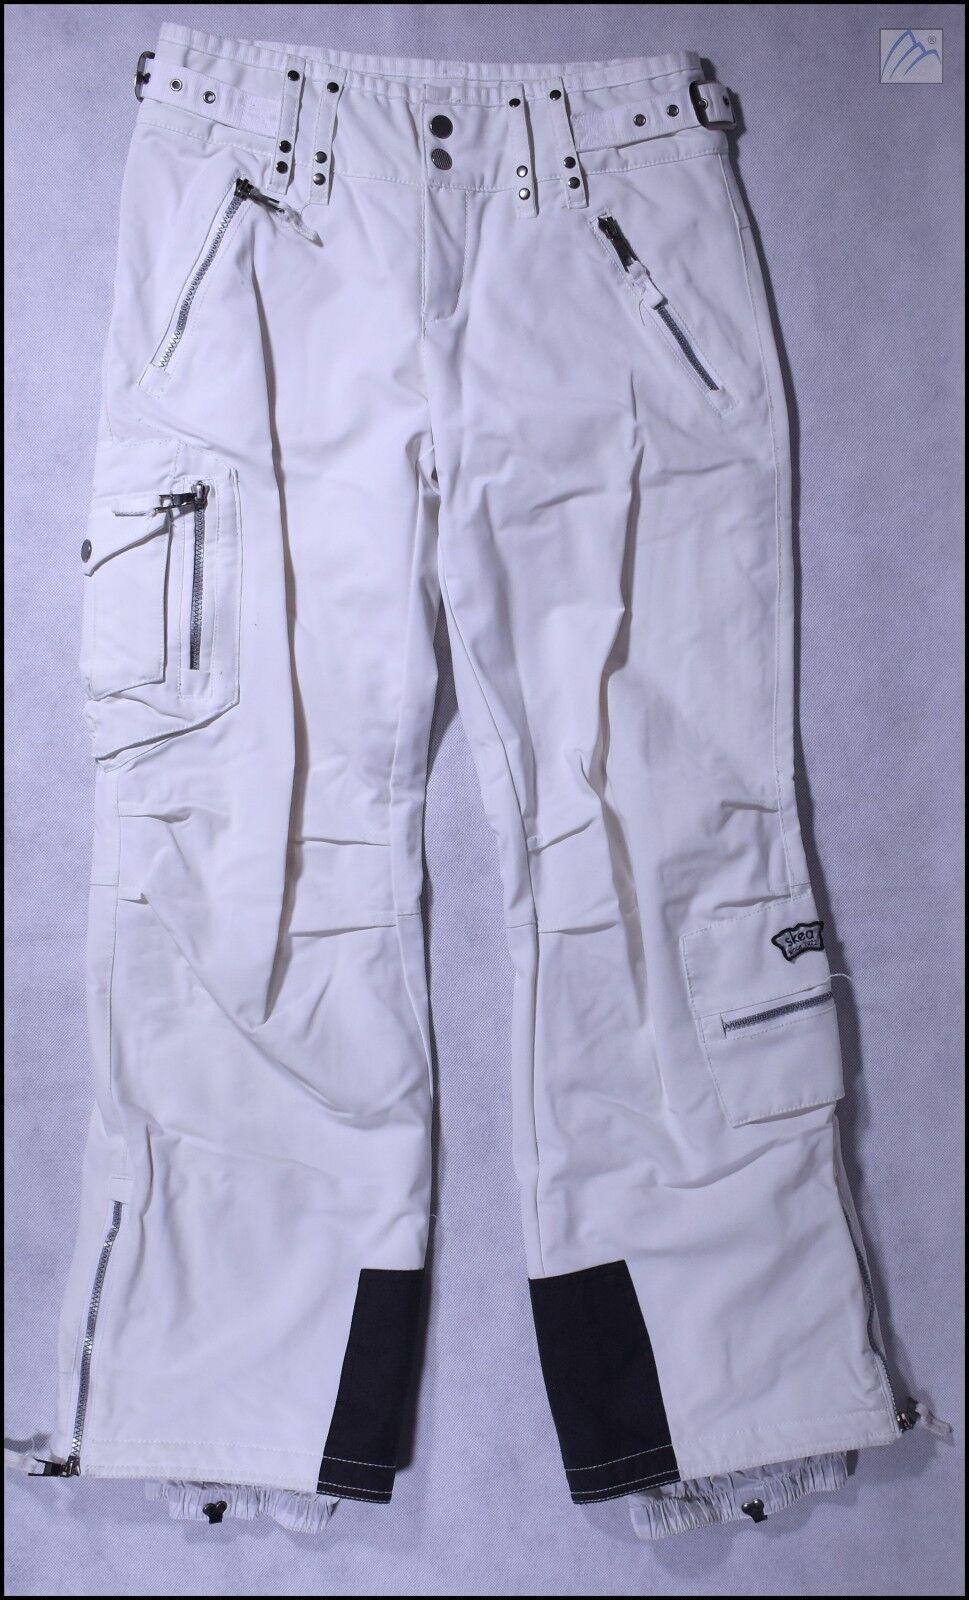 SKEA INSULATED SKI SNOWBOARD PANTS WOMENS US 4 WHITE